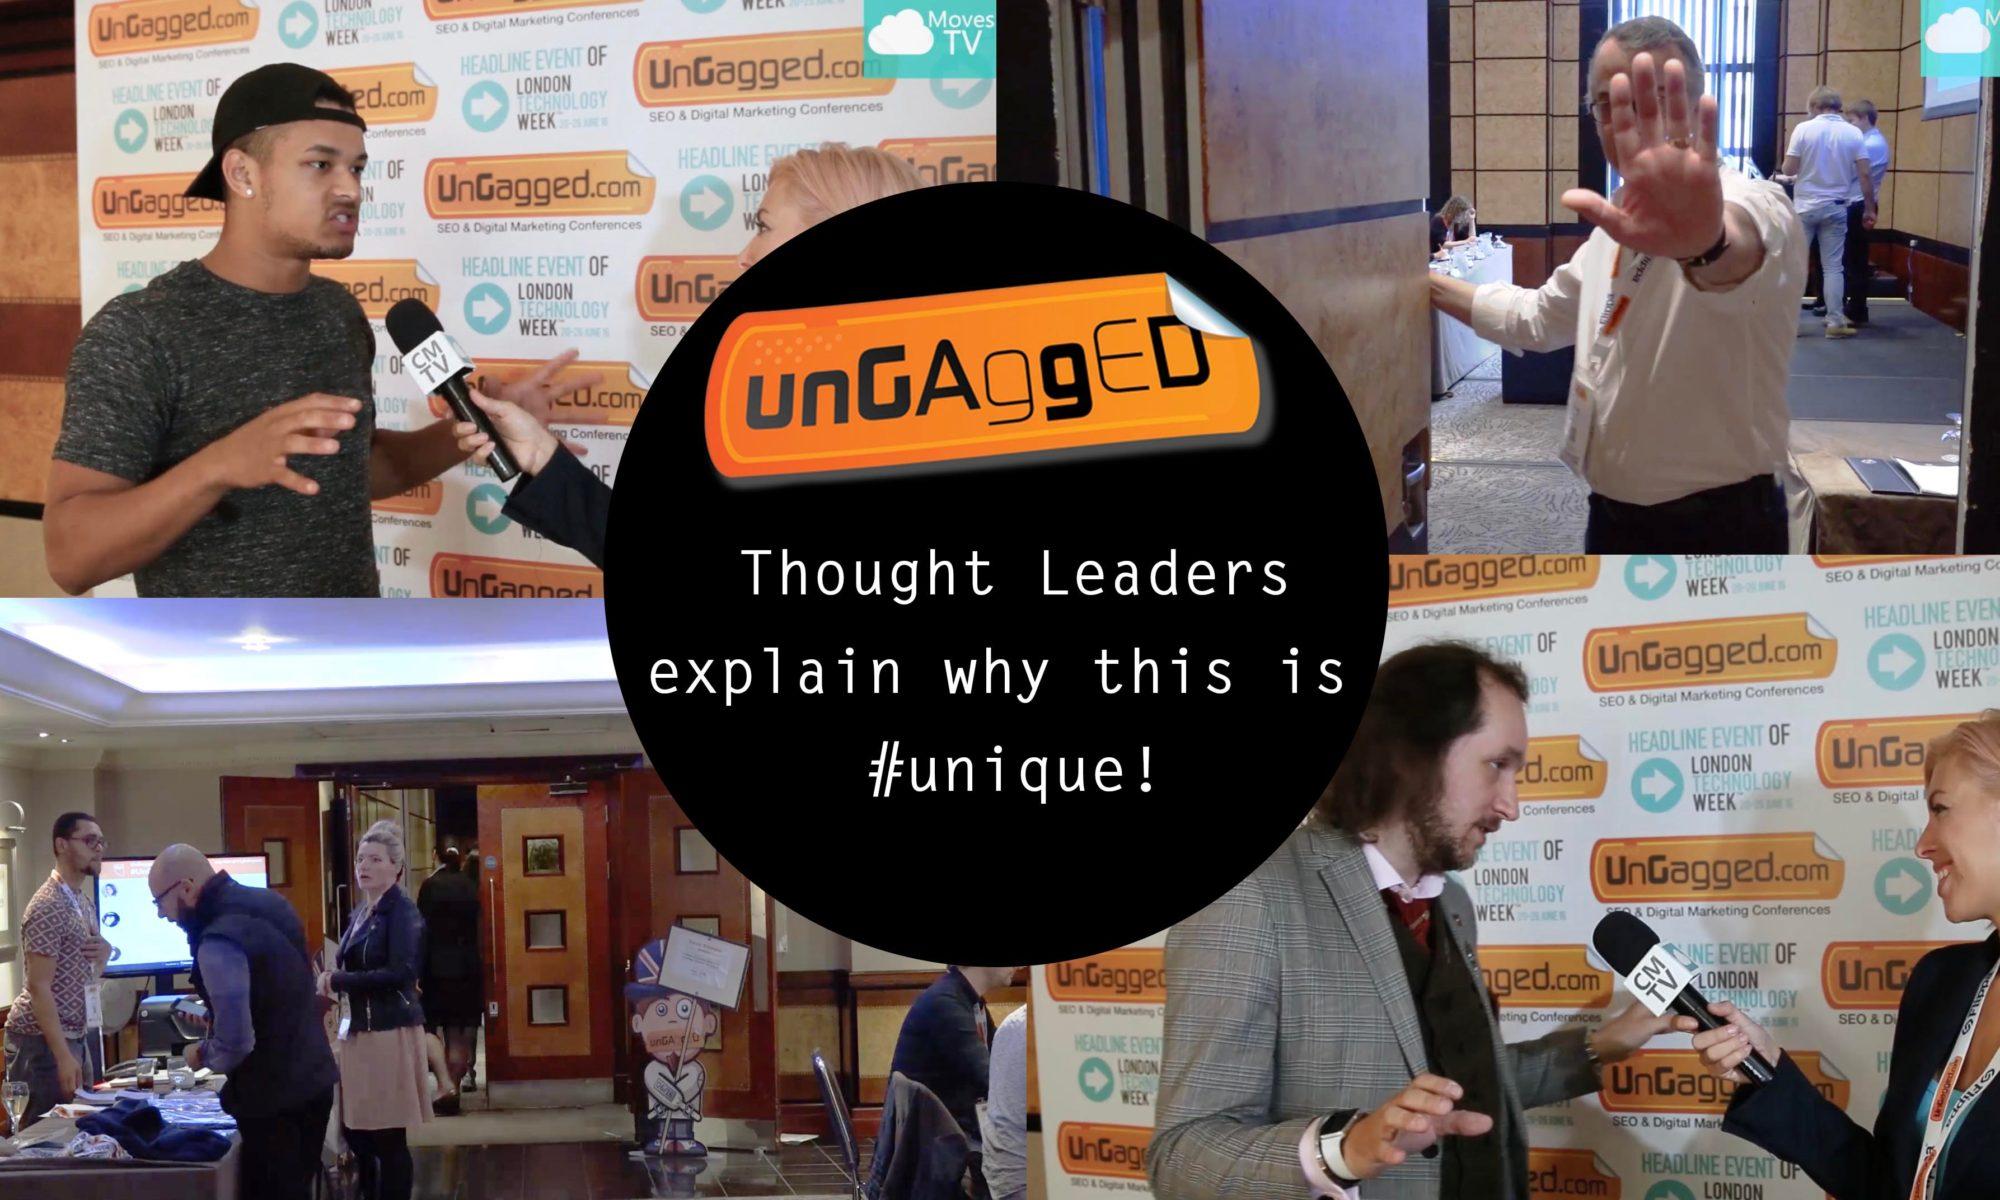 UnGagged London